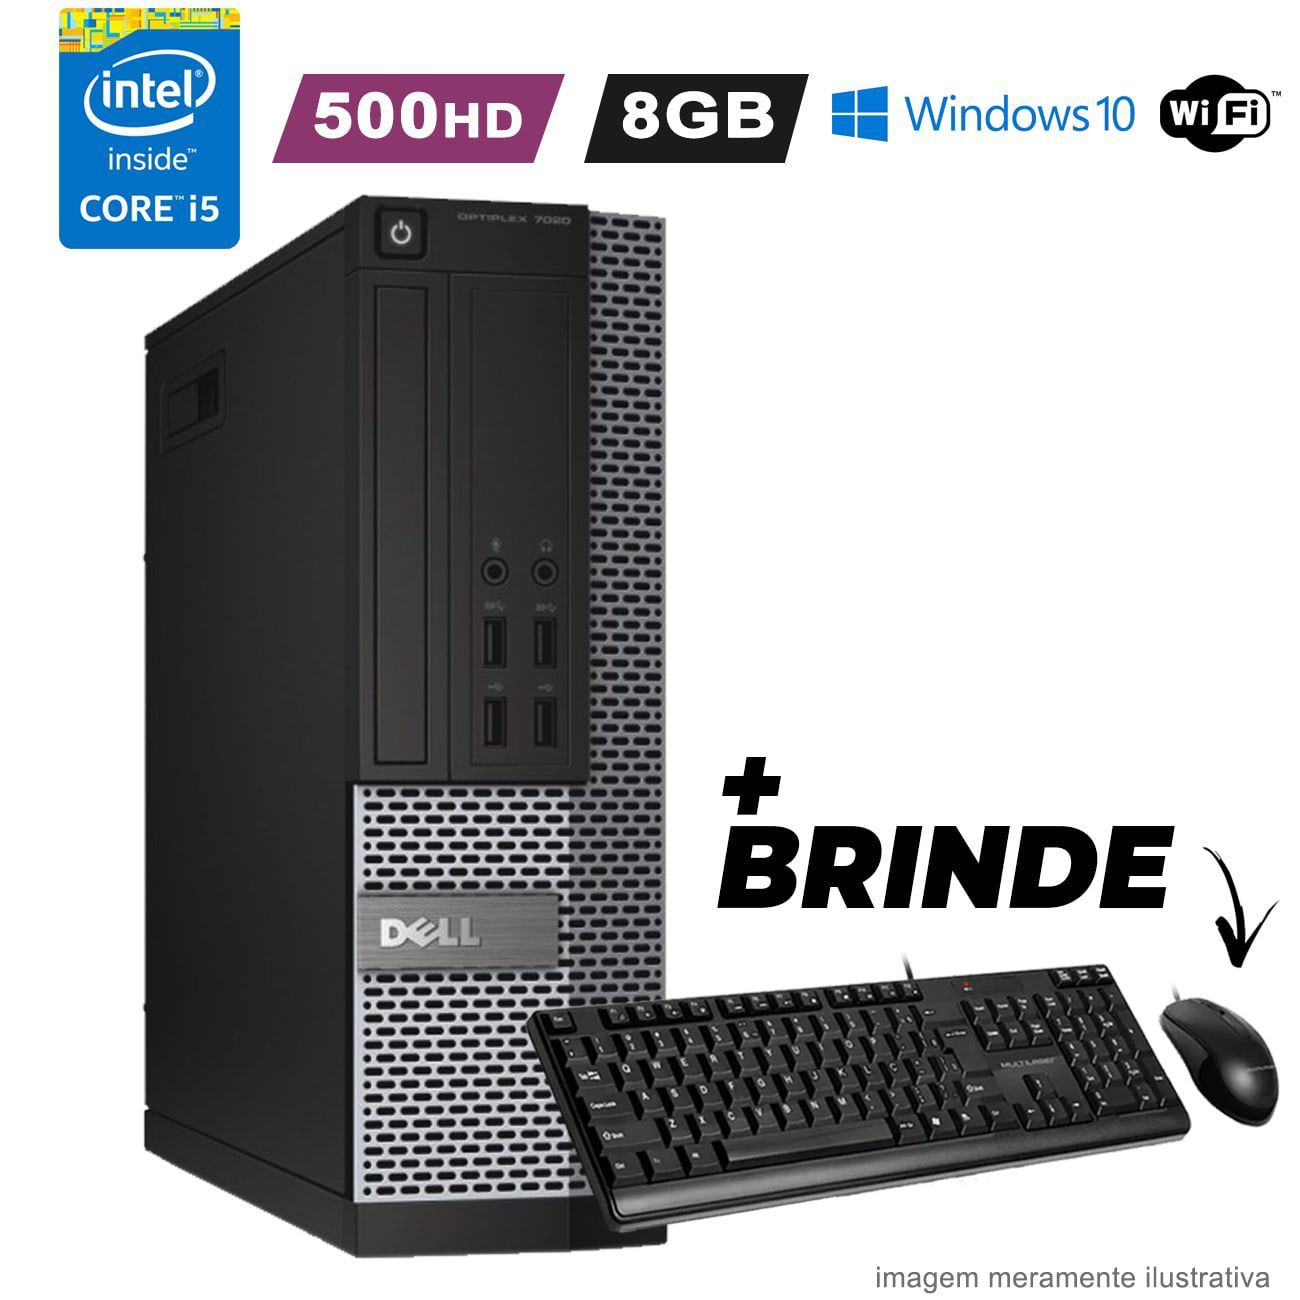 Computador Dell i5 4590 8GB HD 500GB Wifi Win10 Promoção